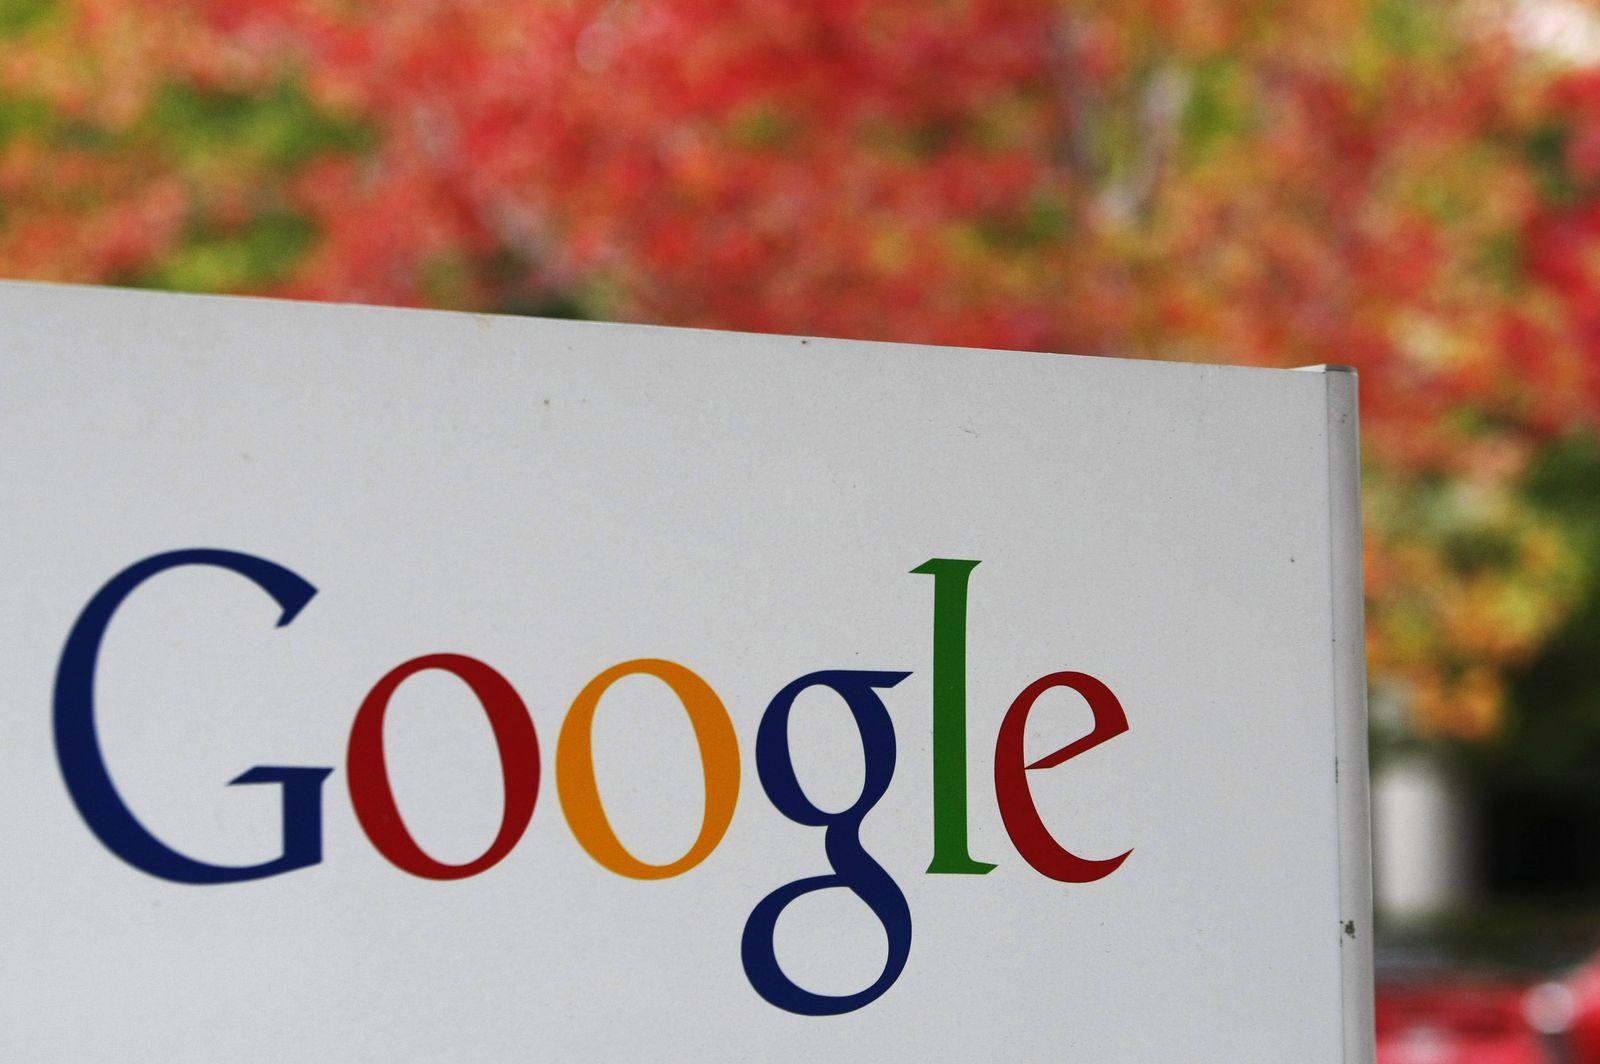 Italy Google Trial